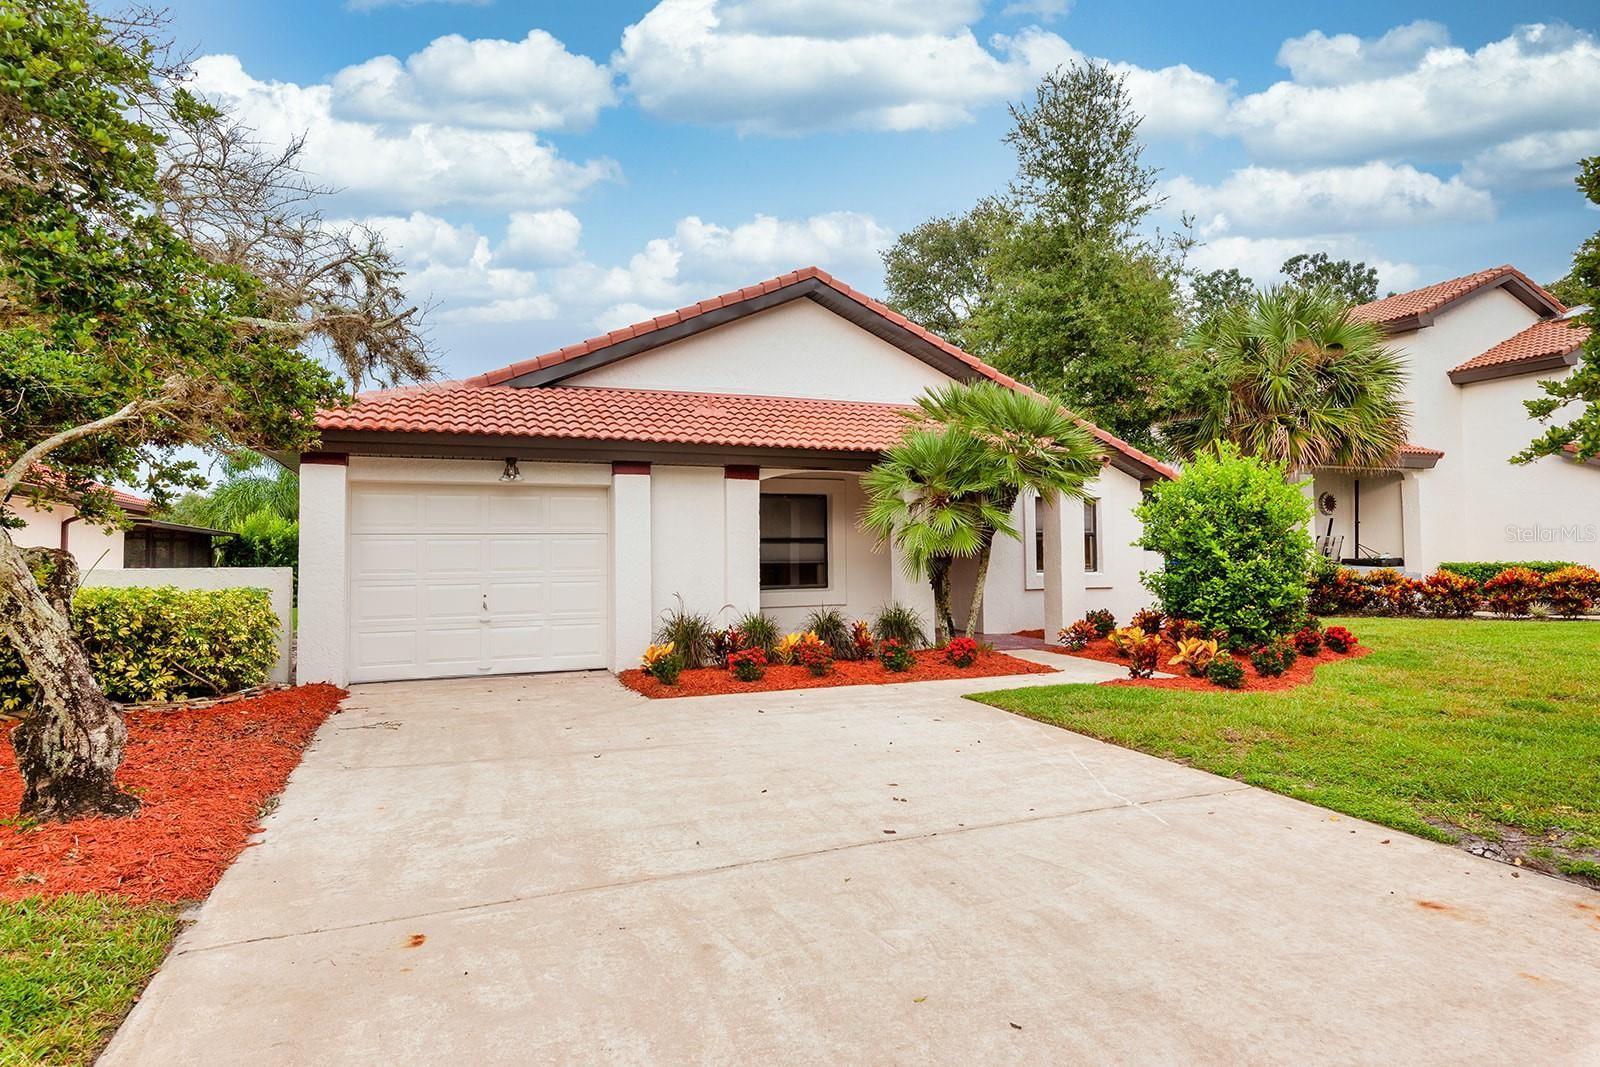 6357 PARSON BROWN DRIVE, Orlando, FL 32819 - #: O5975258